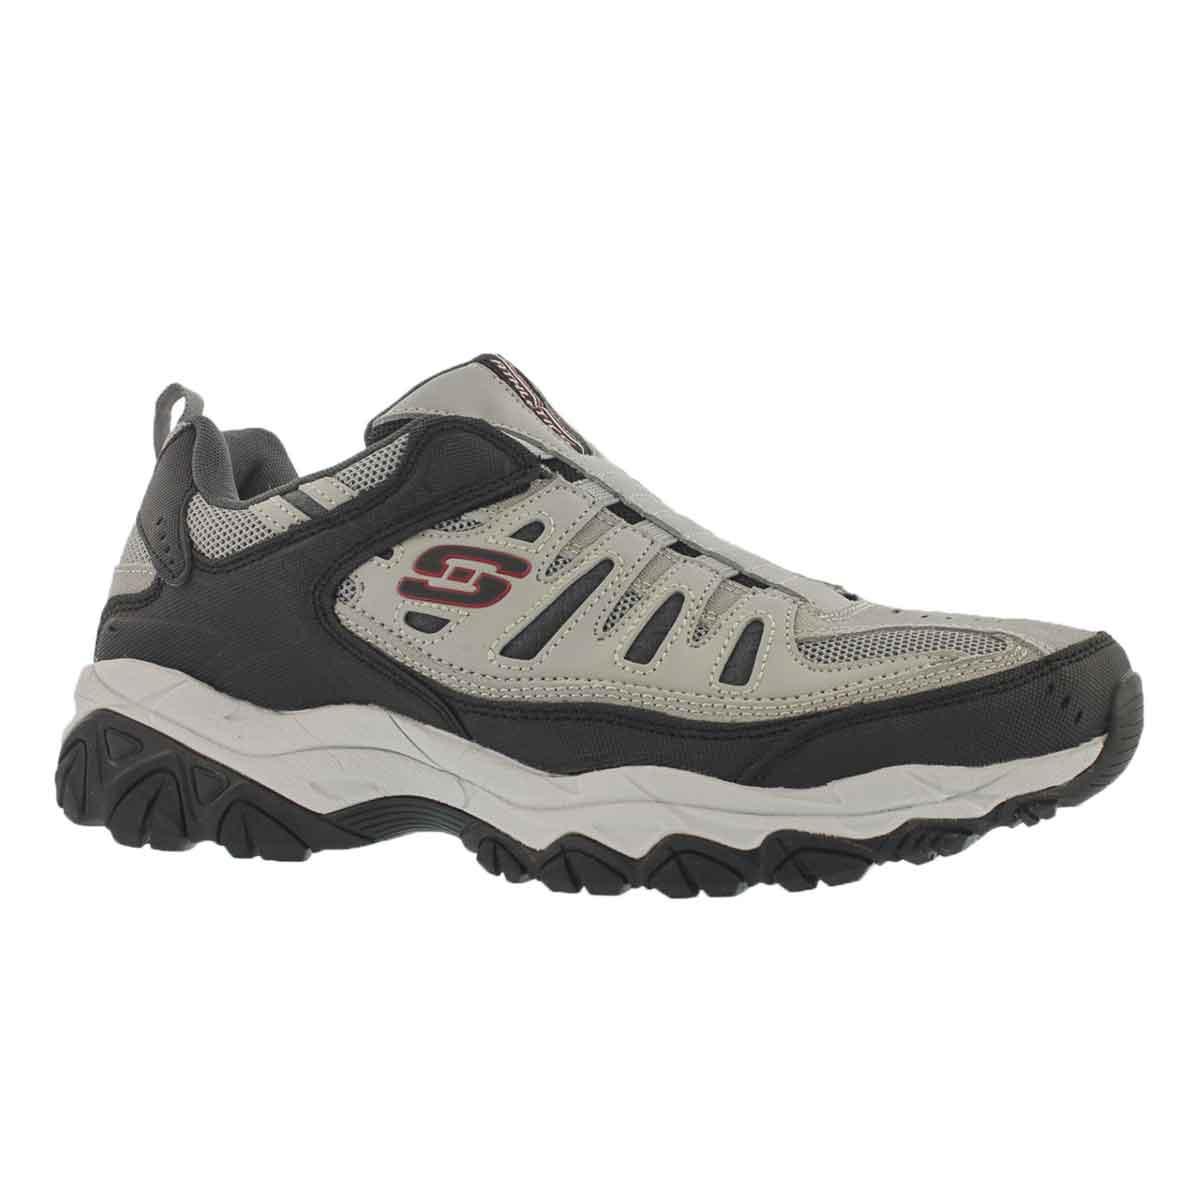 Men's AFTER BURN gy/bk slip on sneakers